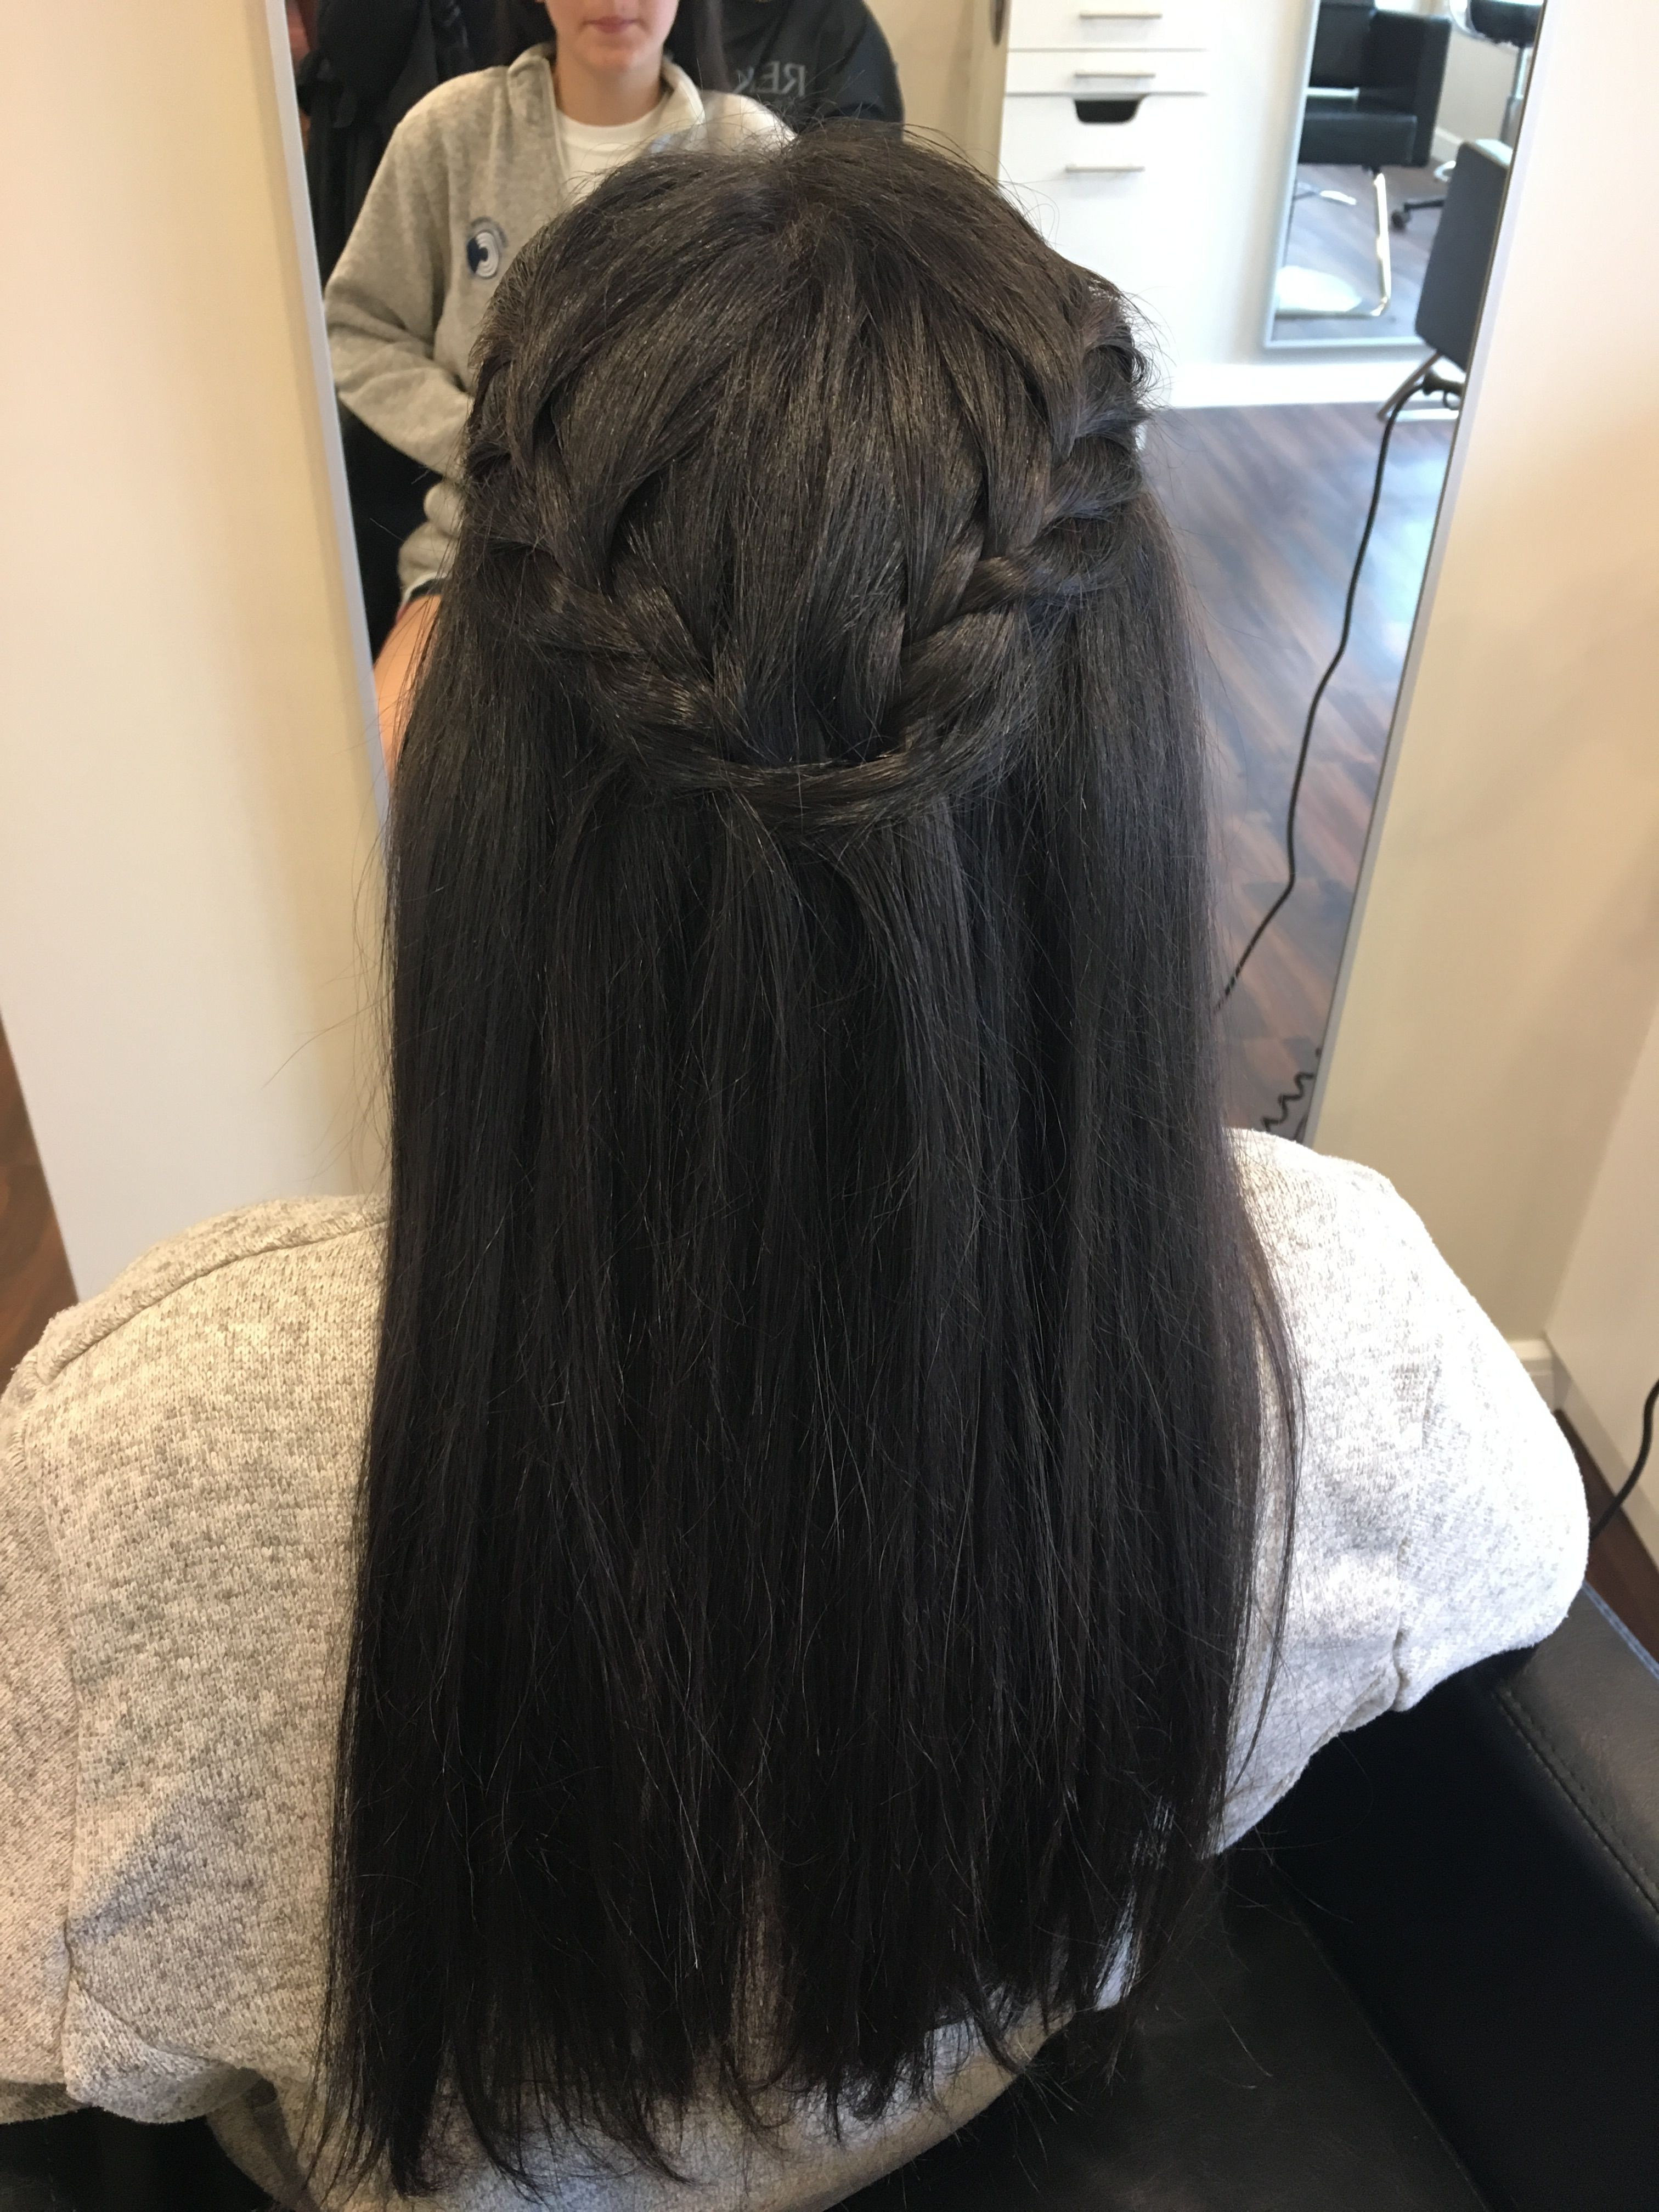 Longhair Braids Straight Prom Hair Prom Hairstyles For Long Hair Long Hair Styles